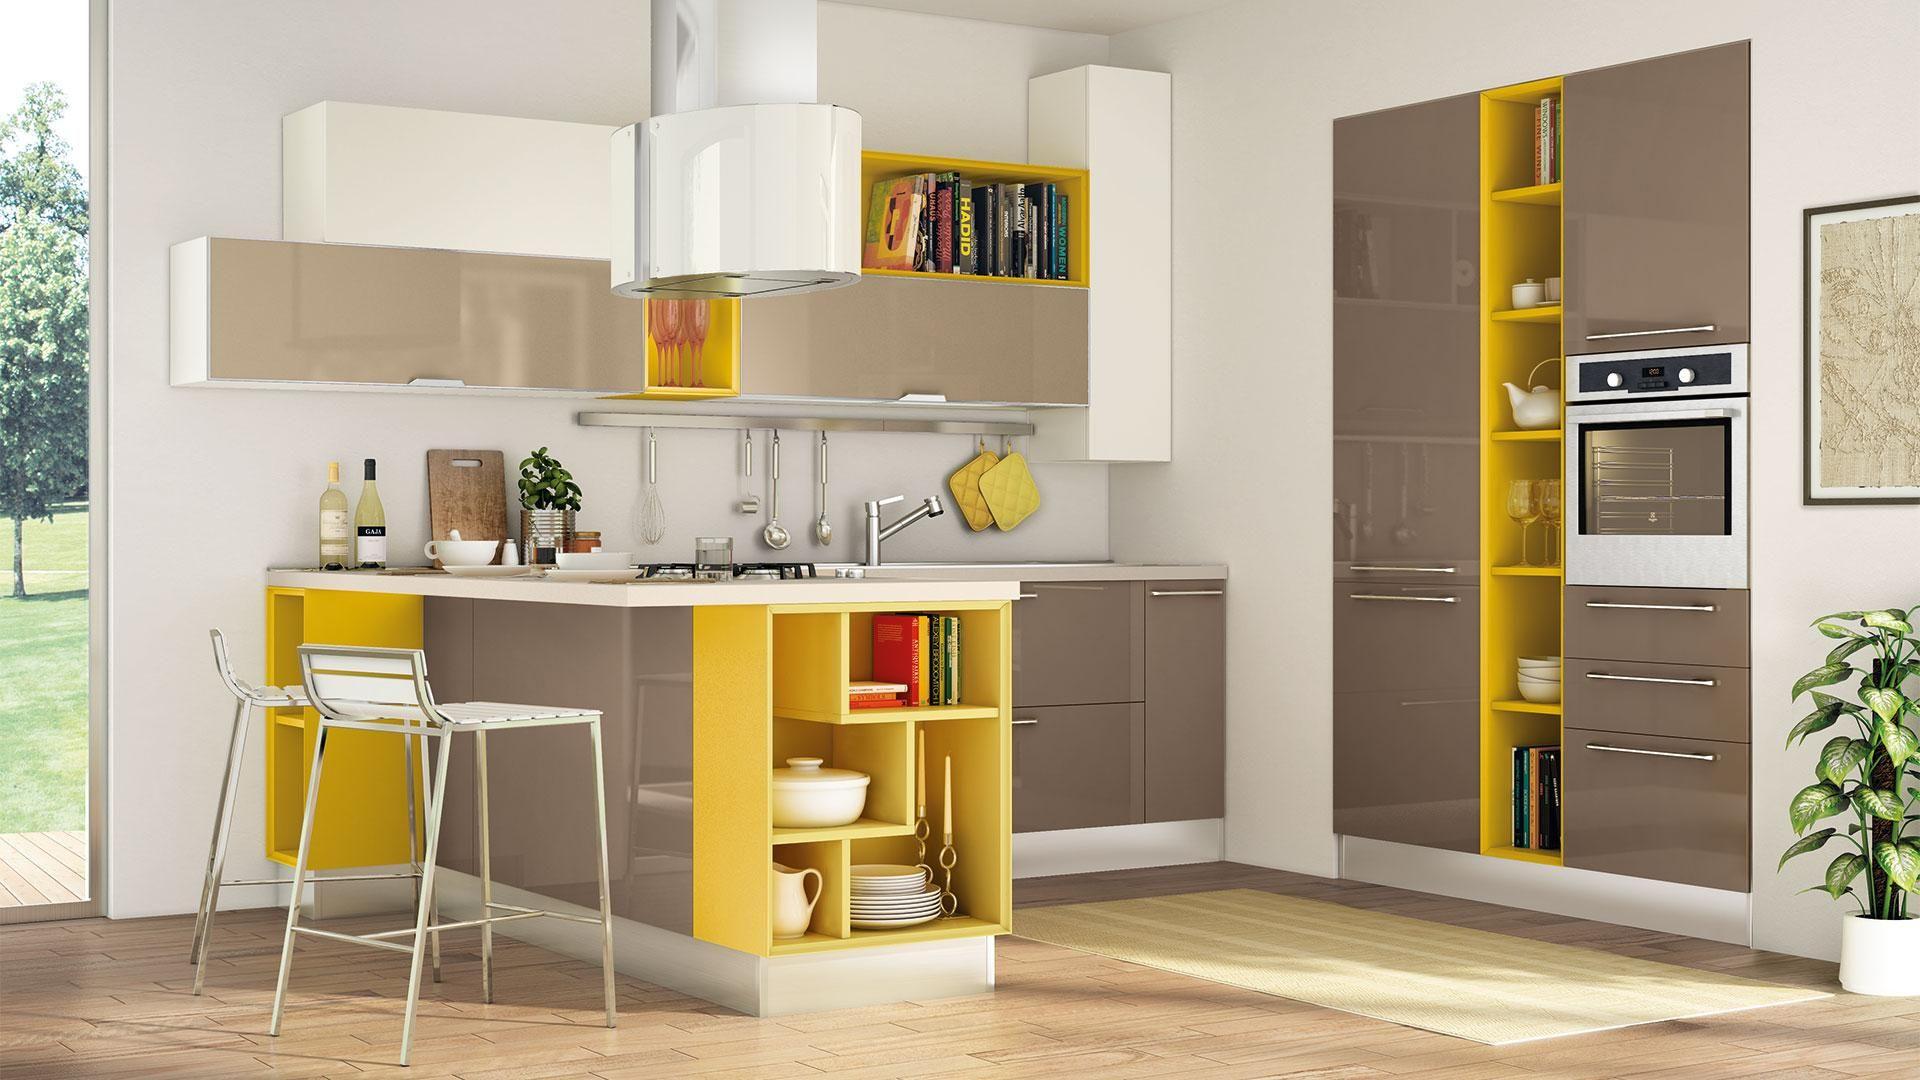 Noemi - Cucine Moderne - Cucine Lube | Interior design | Pinterest